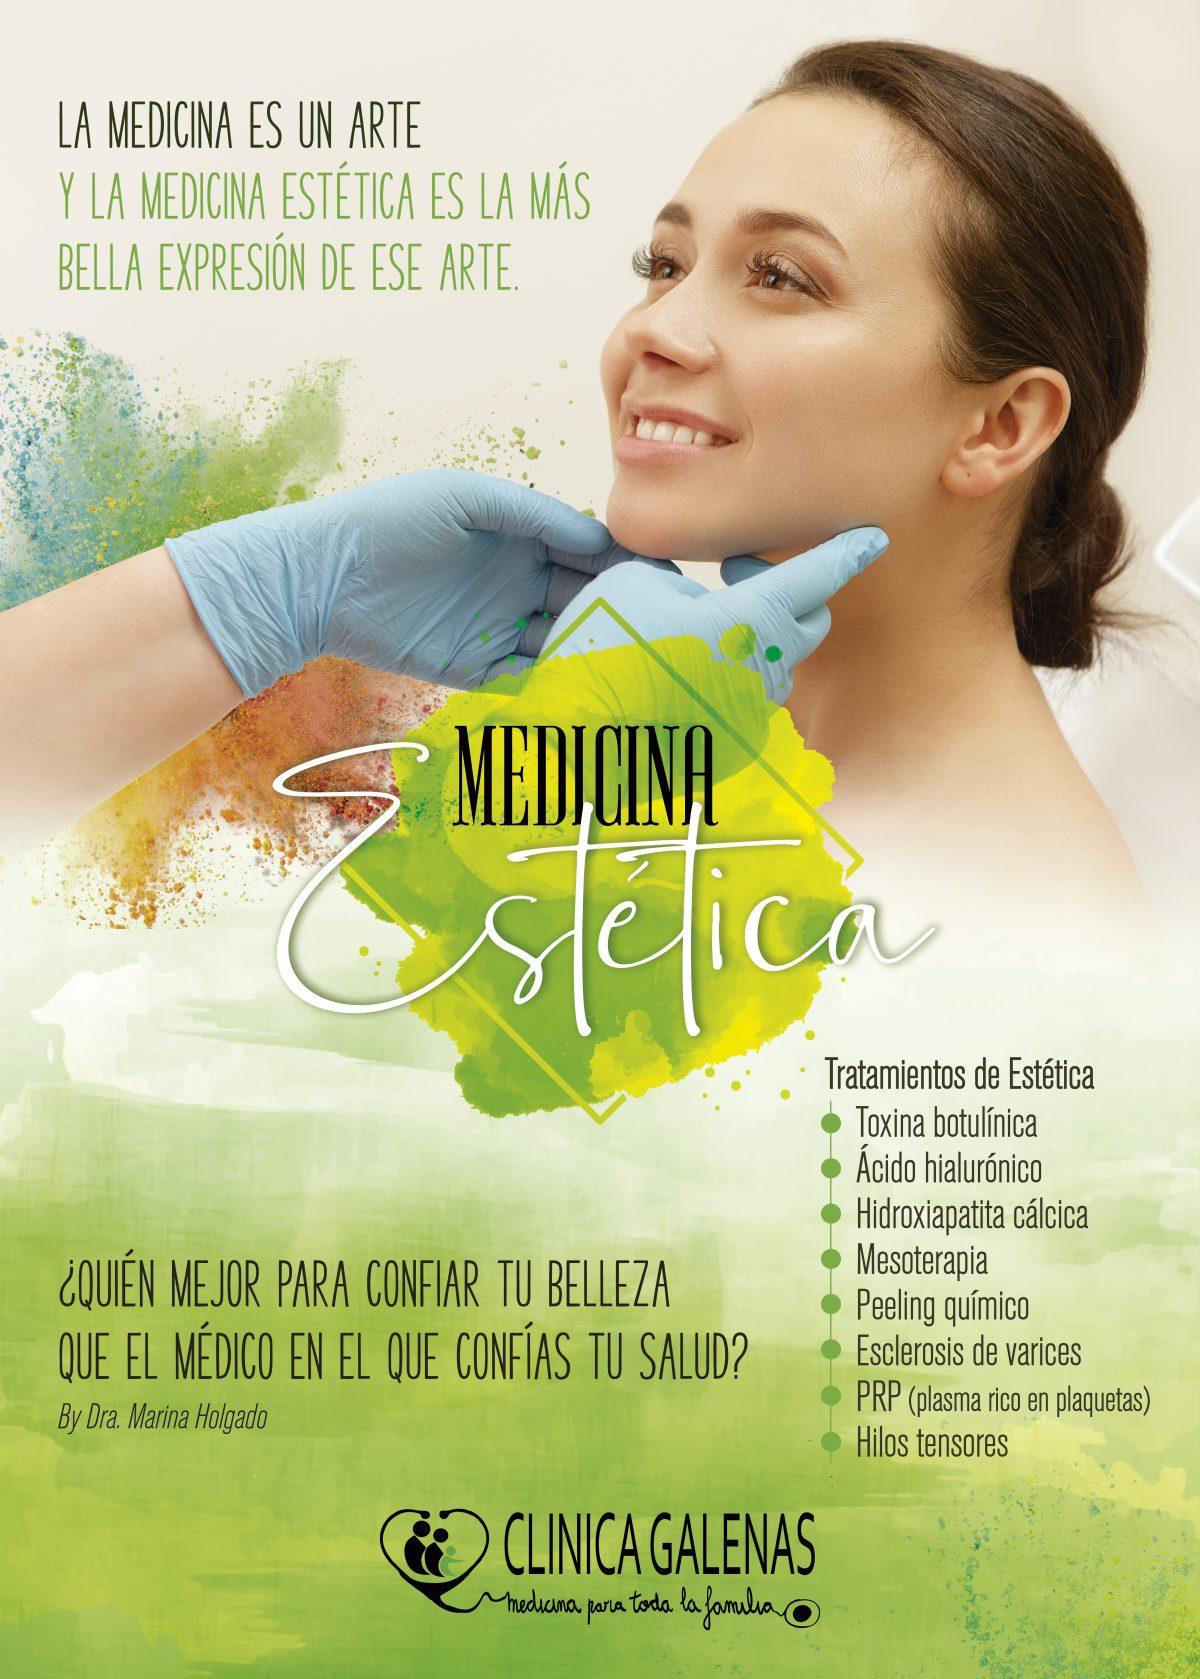 Cartel Estetica Galenas 1200x1679 - Medicina Estética